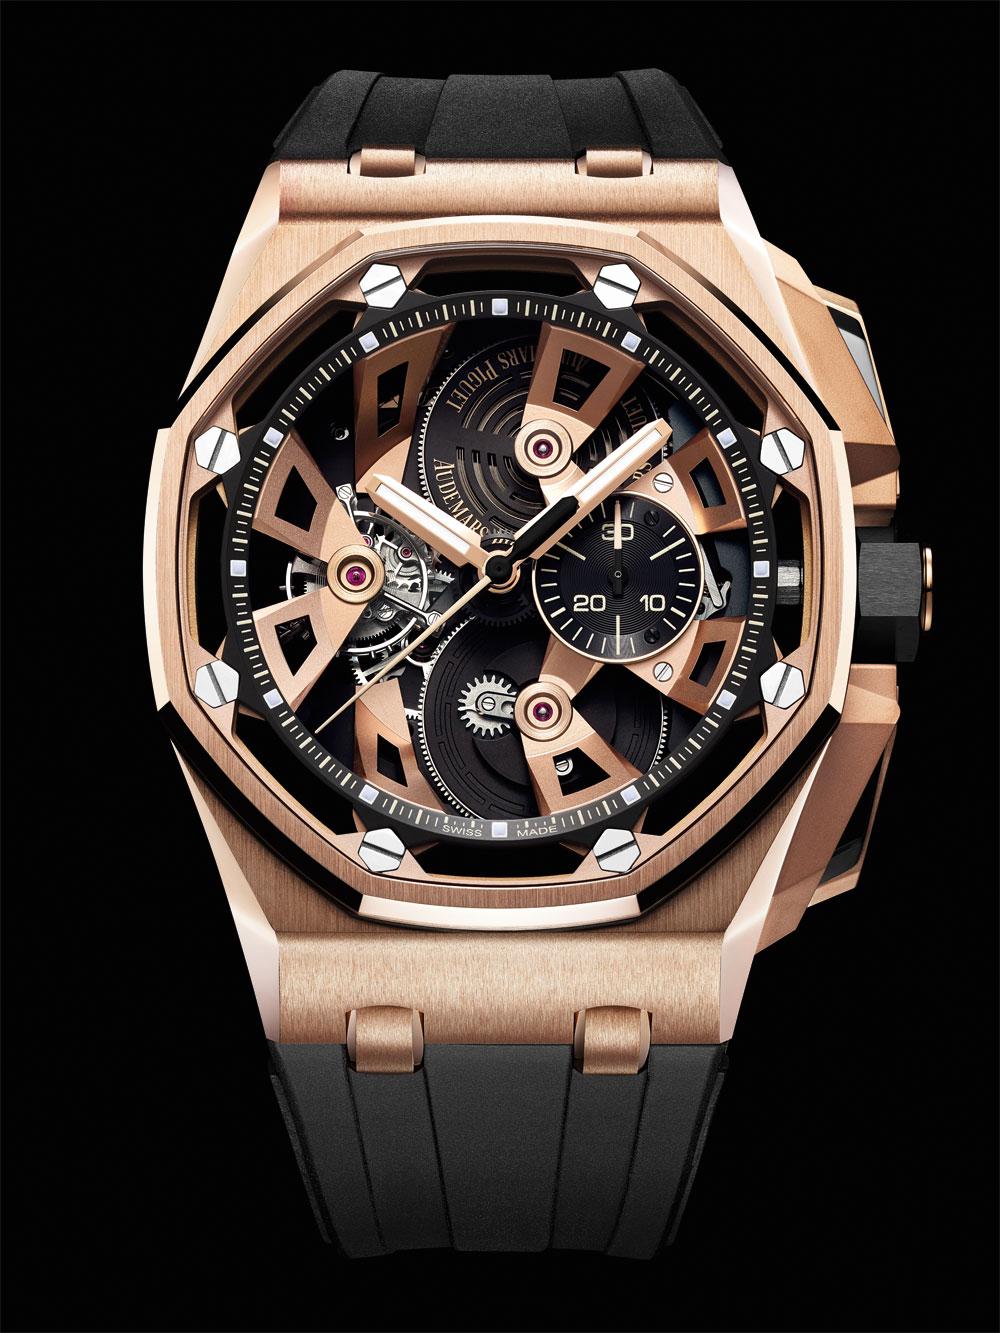 Reloj Audemars Piguet Royal Oak Offshore Tourbillon Chronograph oro rosa